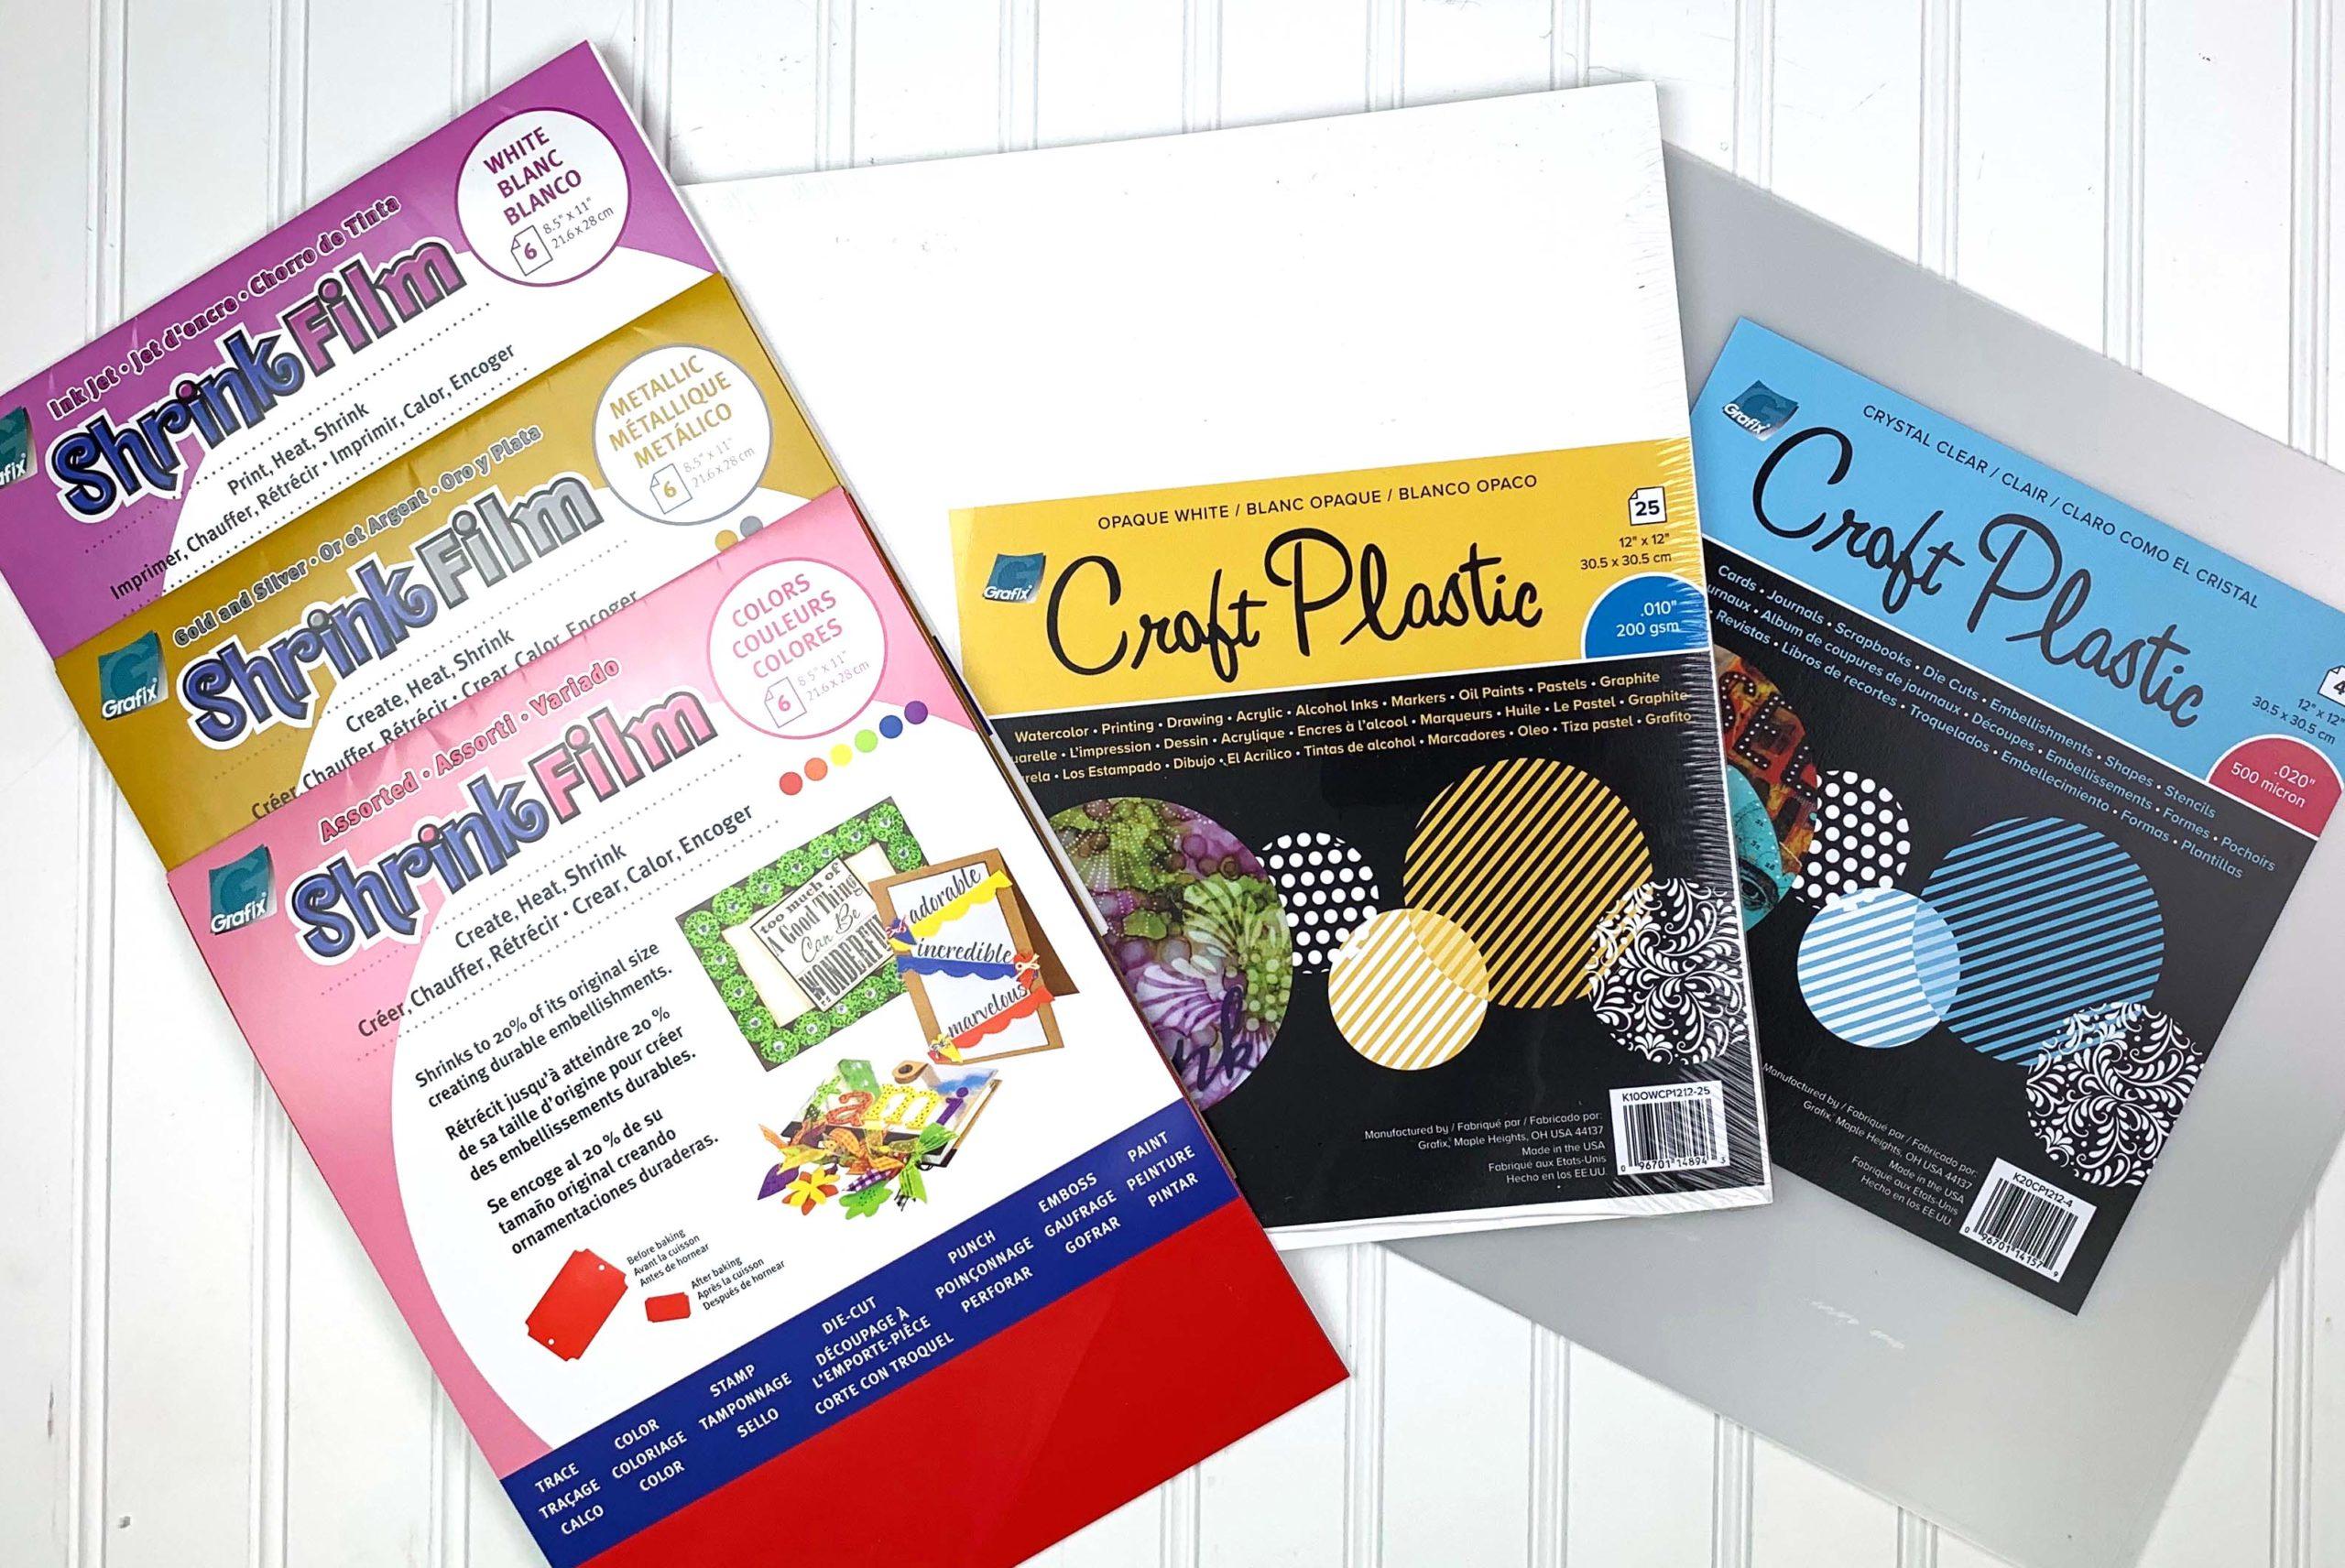 Grafix Prize Package